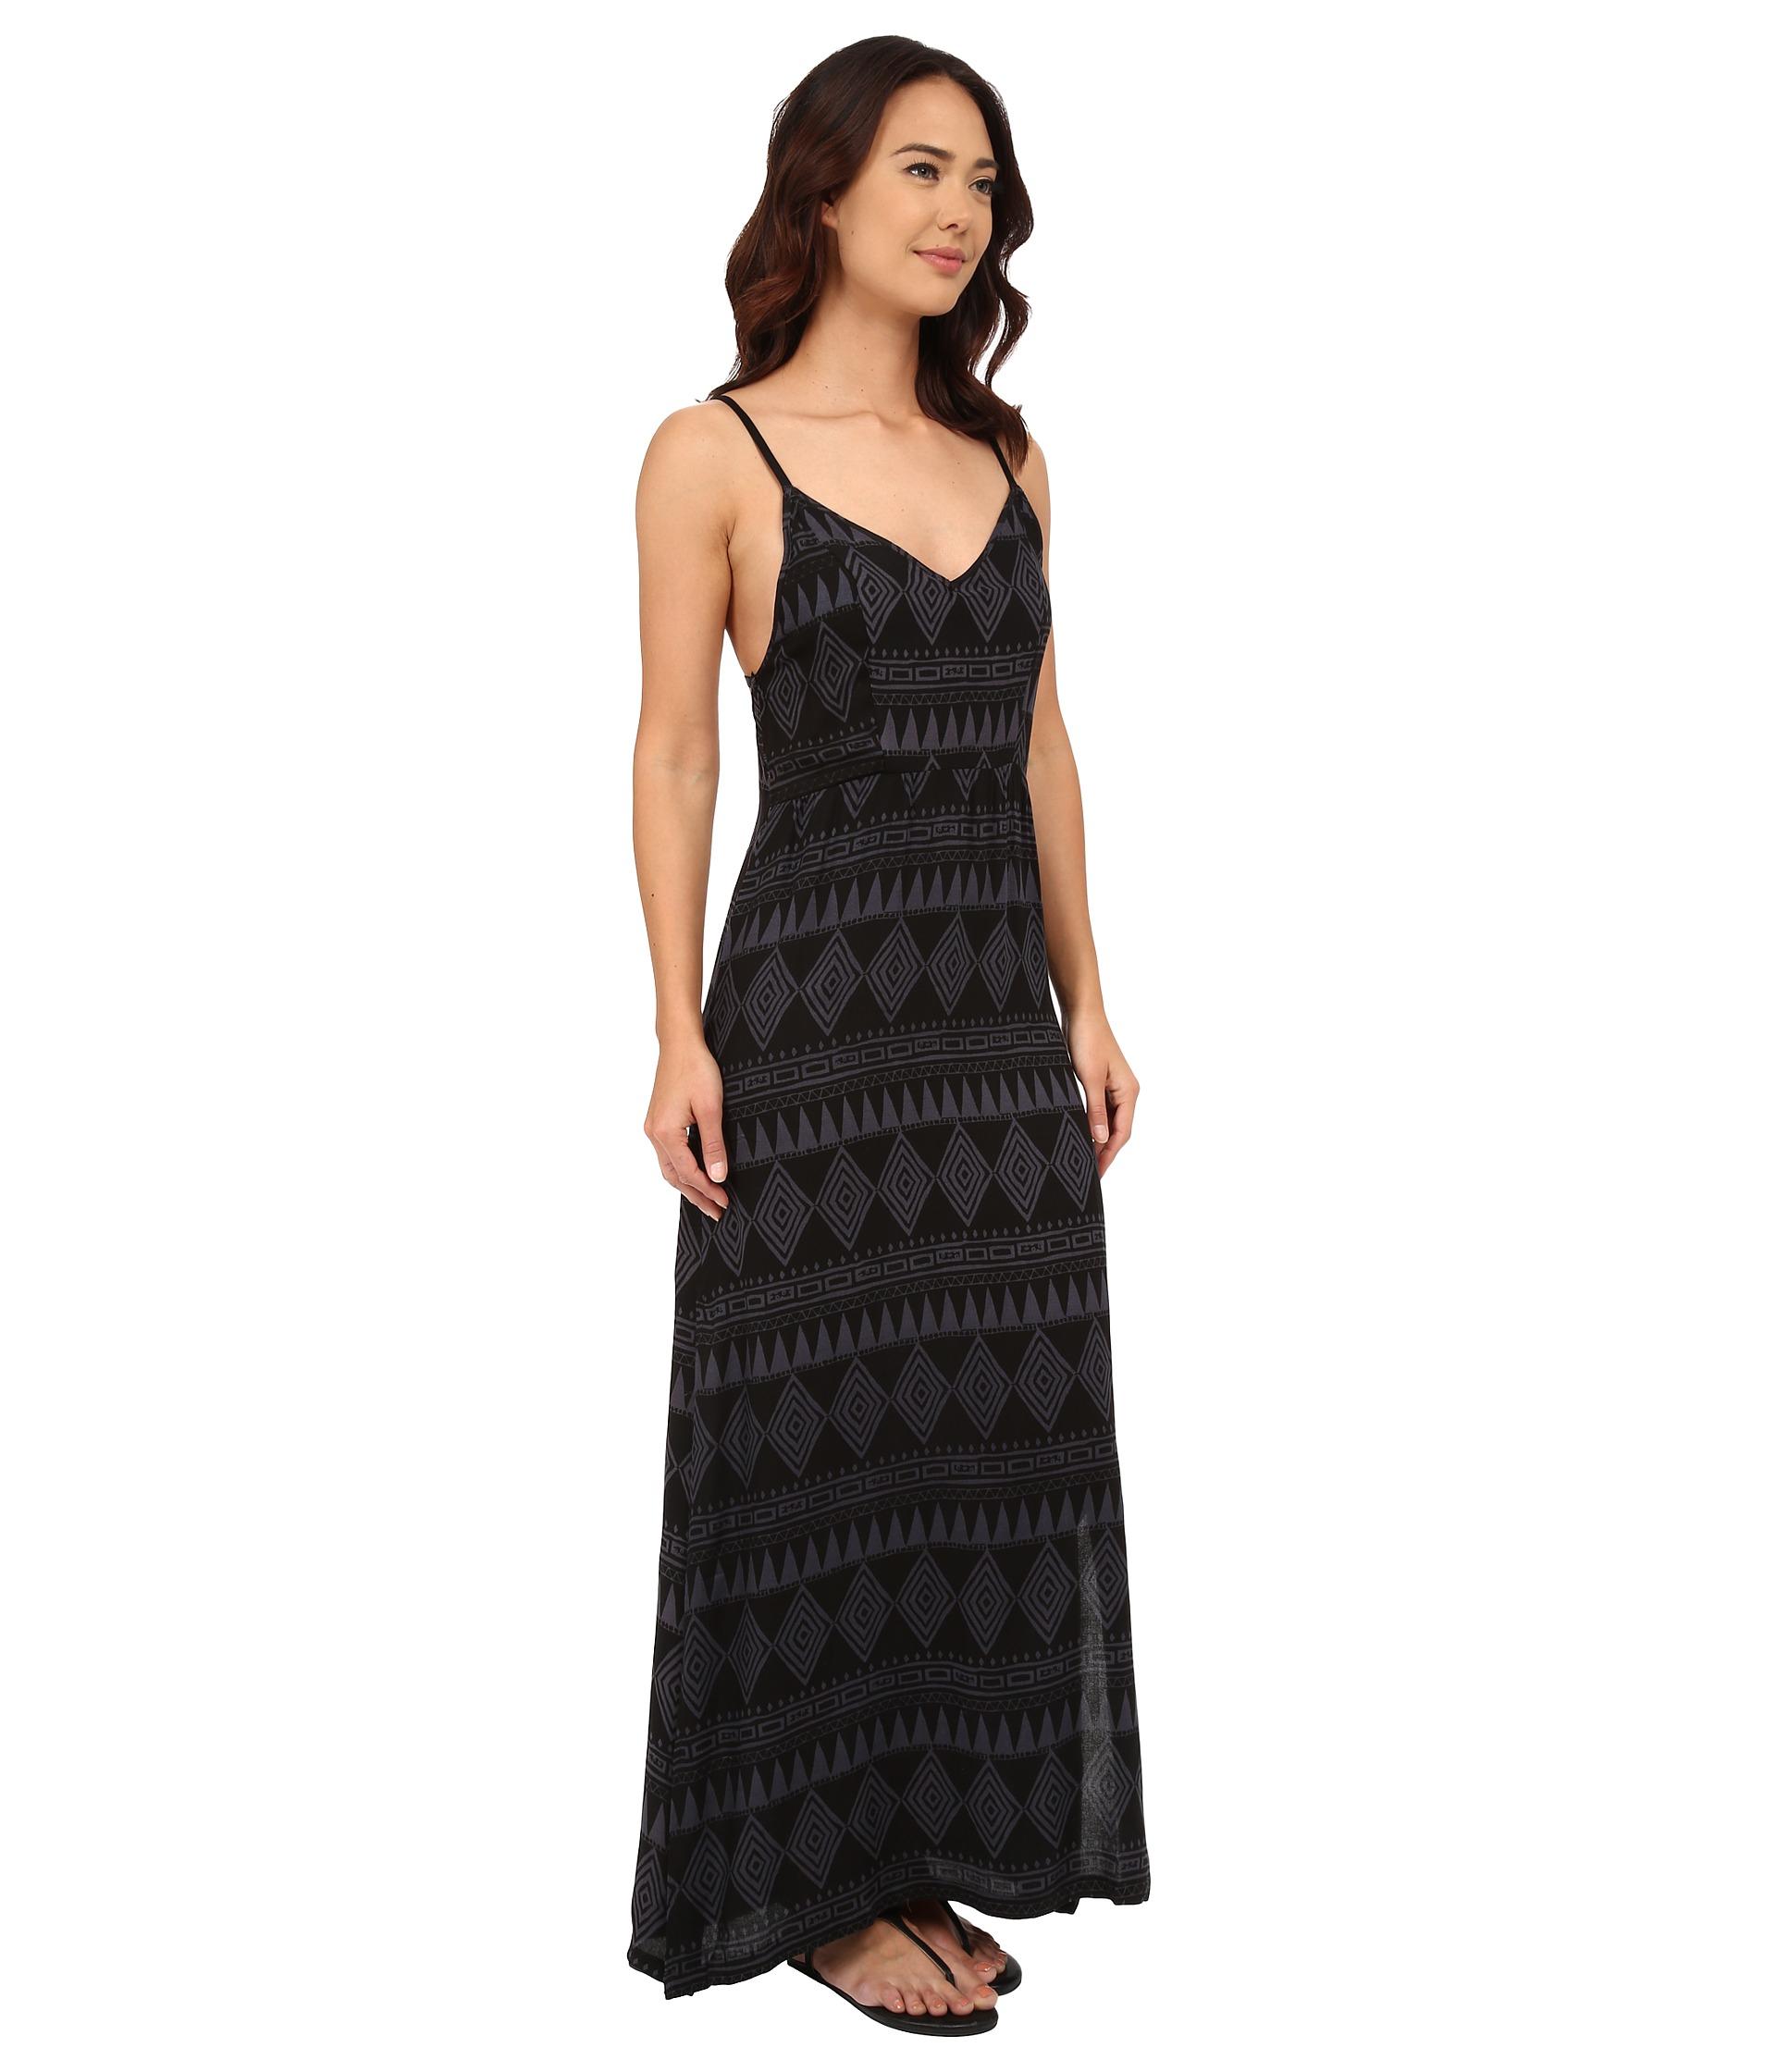 Hurley Silvina Maxi Dress in Black - Lyst